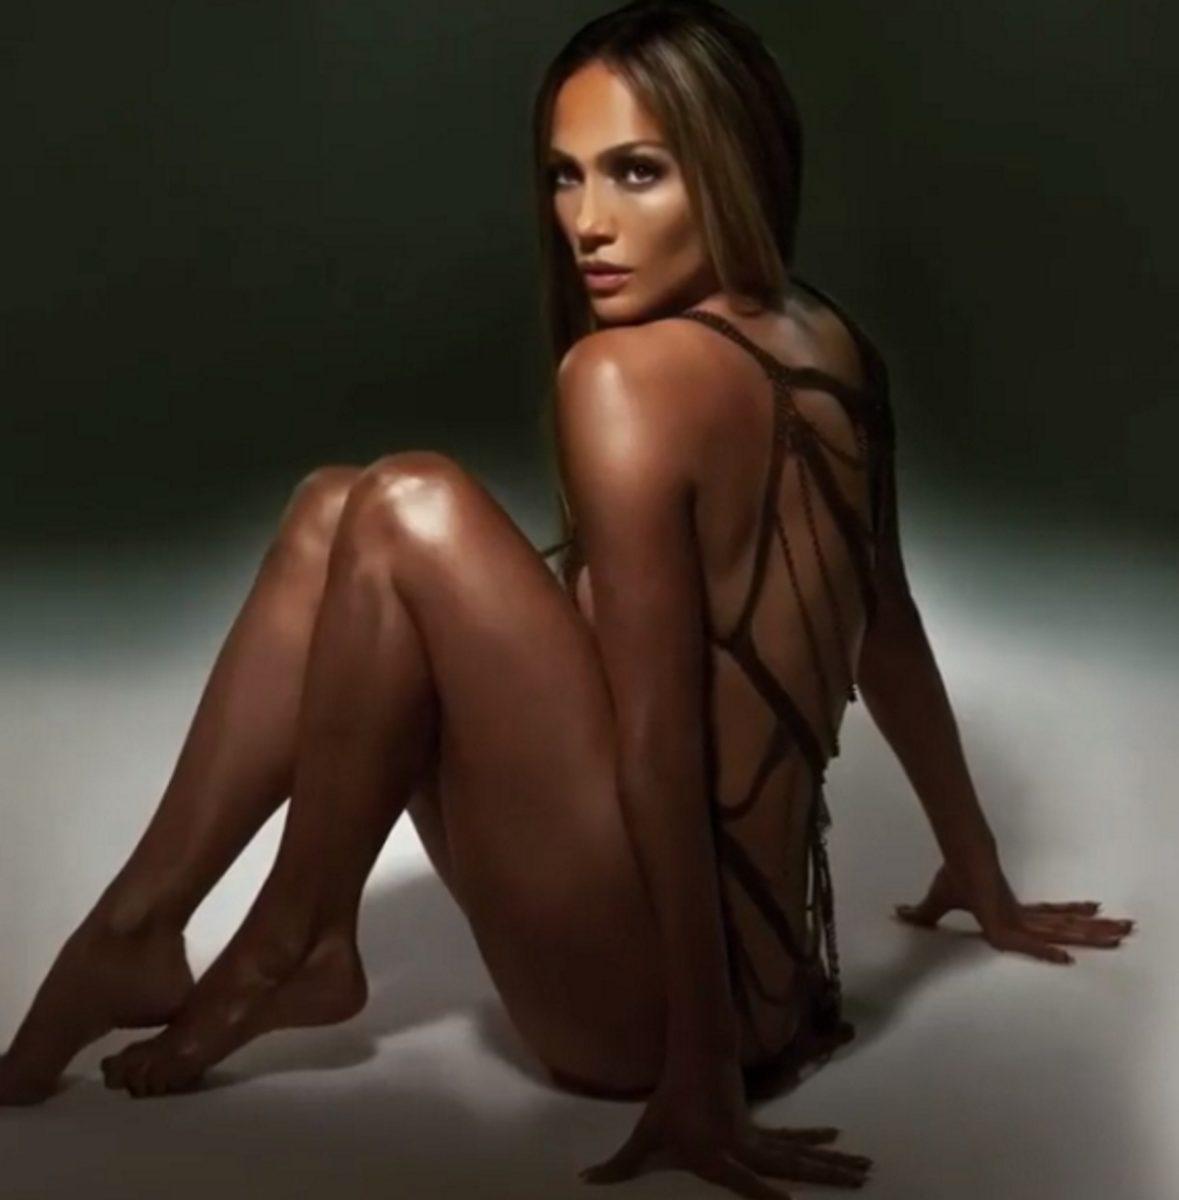 Jennifer Lopez: Φωτιά στα 50! Φωτογραφίζεται μόνο με λίγα… σχοινιά για το νέο της τραγούδι! | tlife.gr